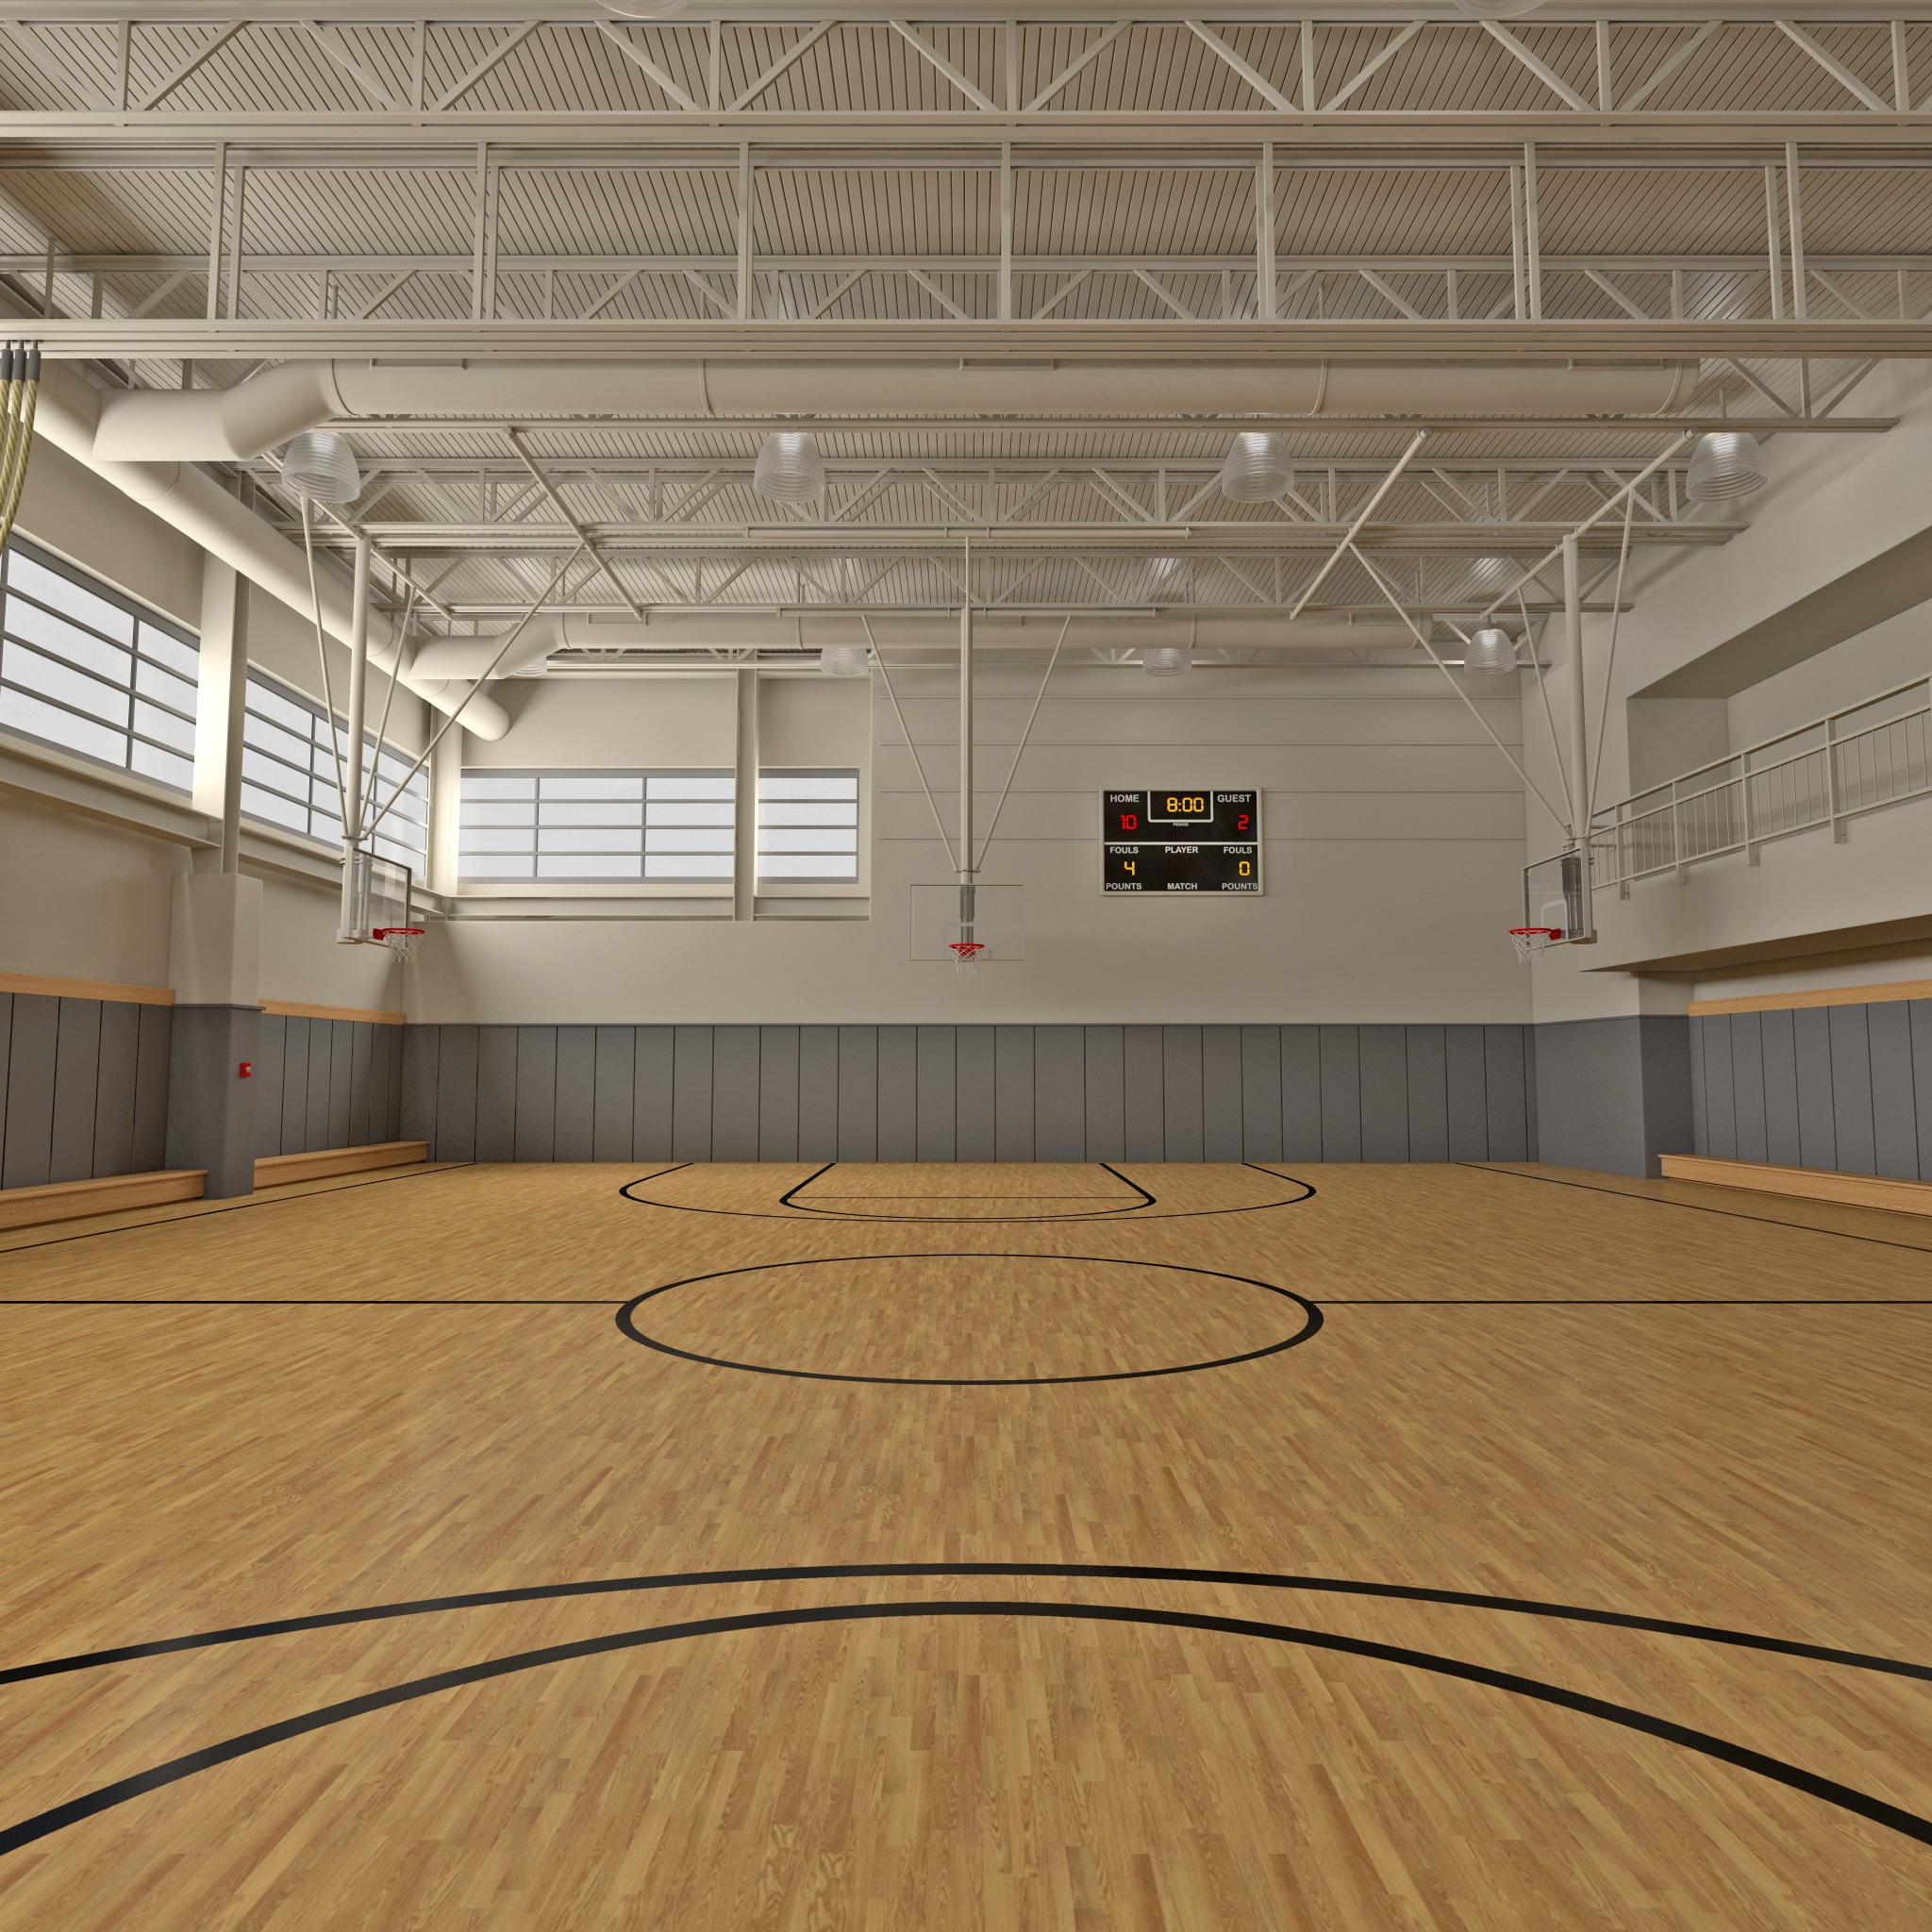 Basketball Gym_1.jpg